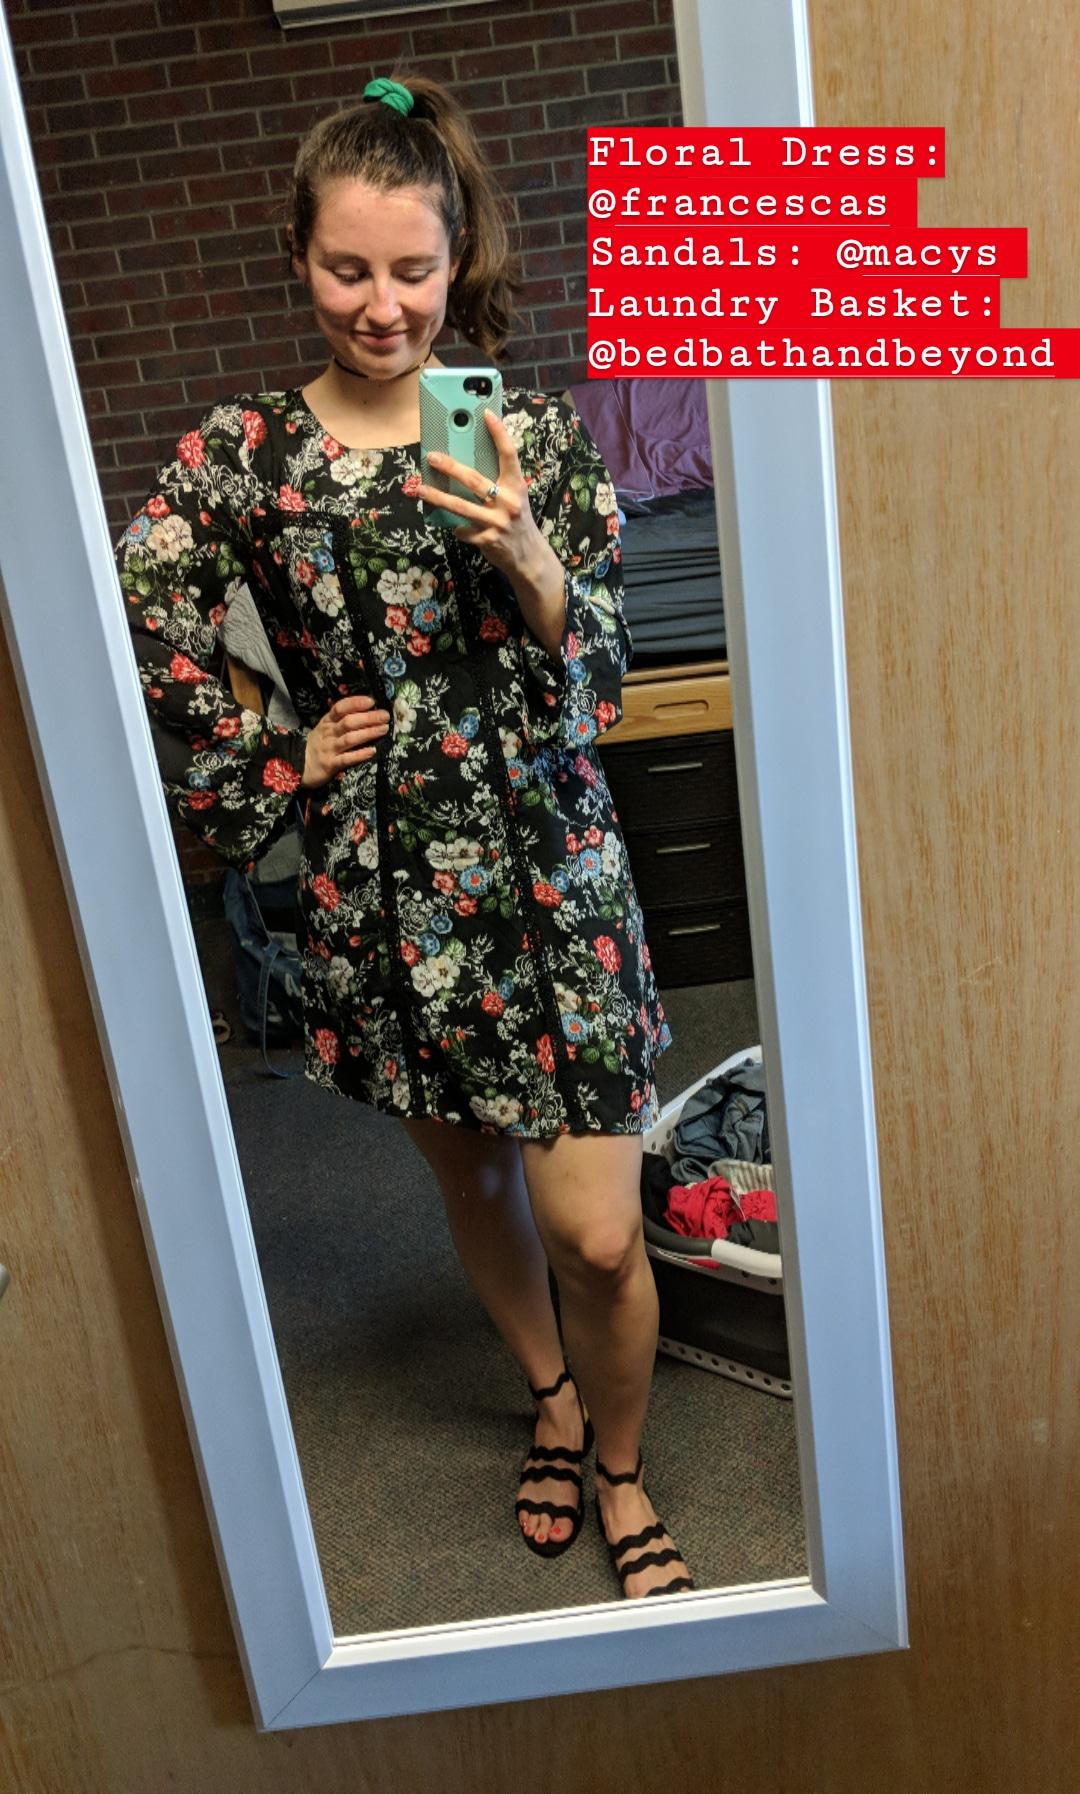 black floral dress, black wavy sandals